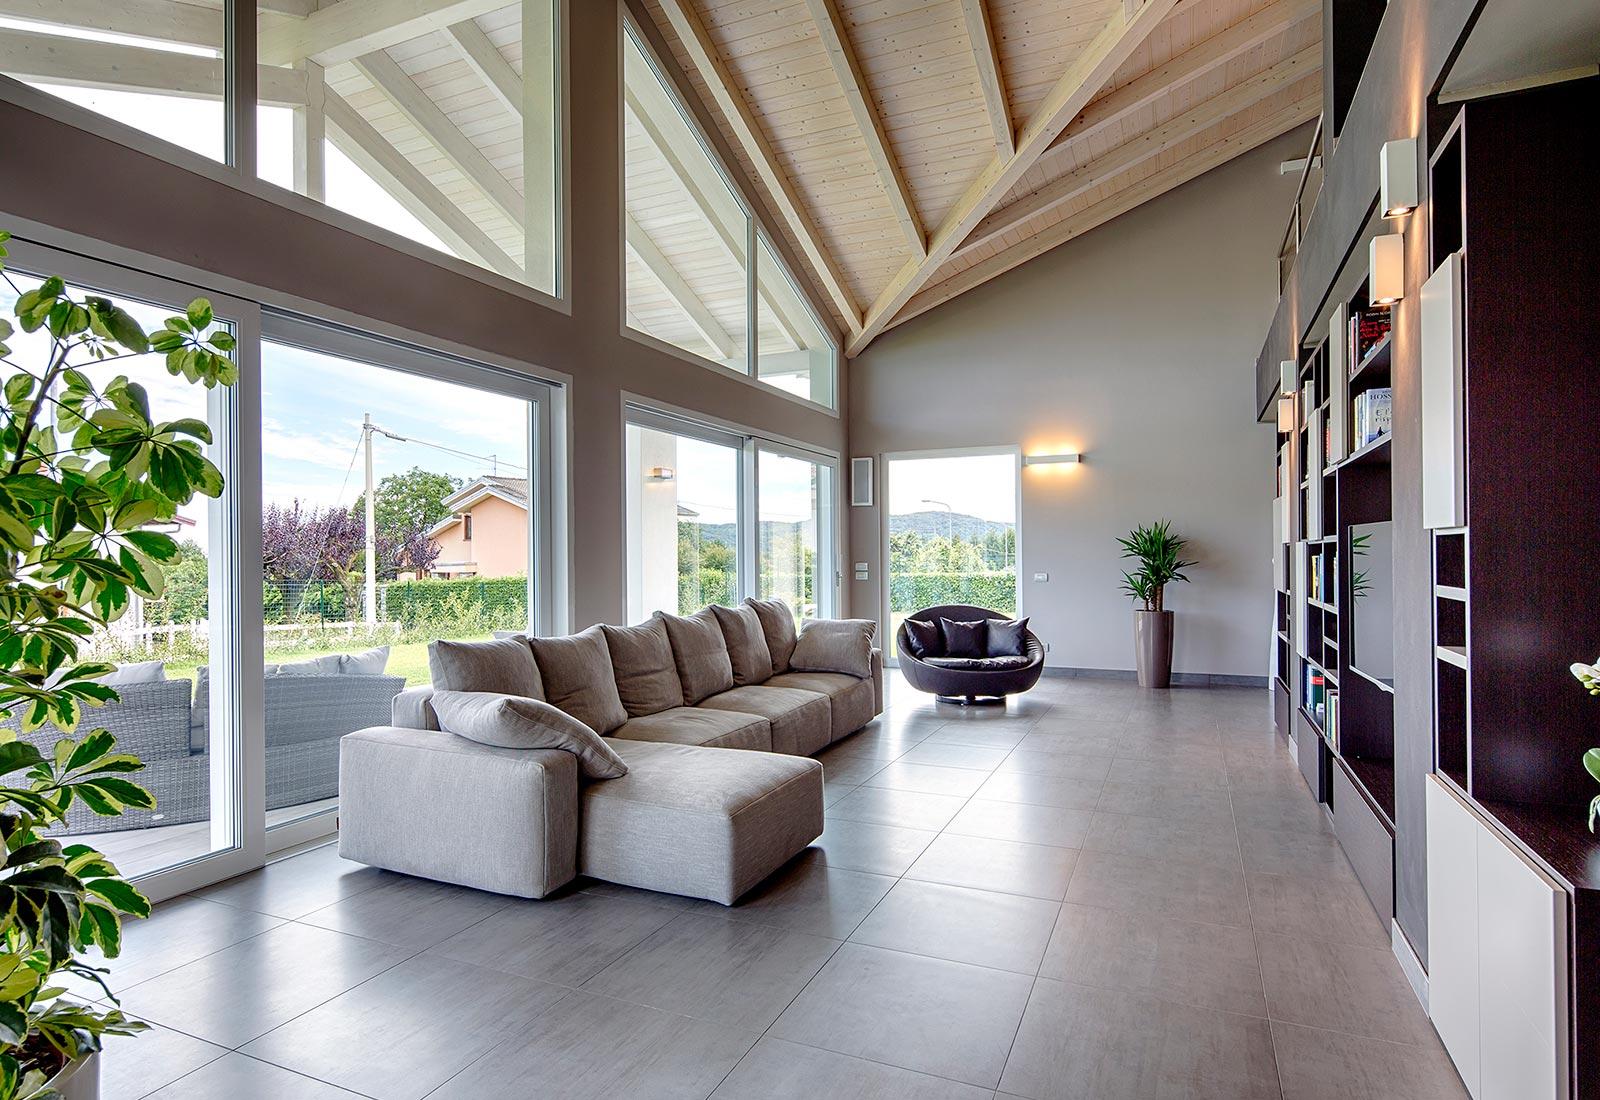 Casa-in-legno-Nebbiuno-Novara-Kager-Italia-05